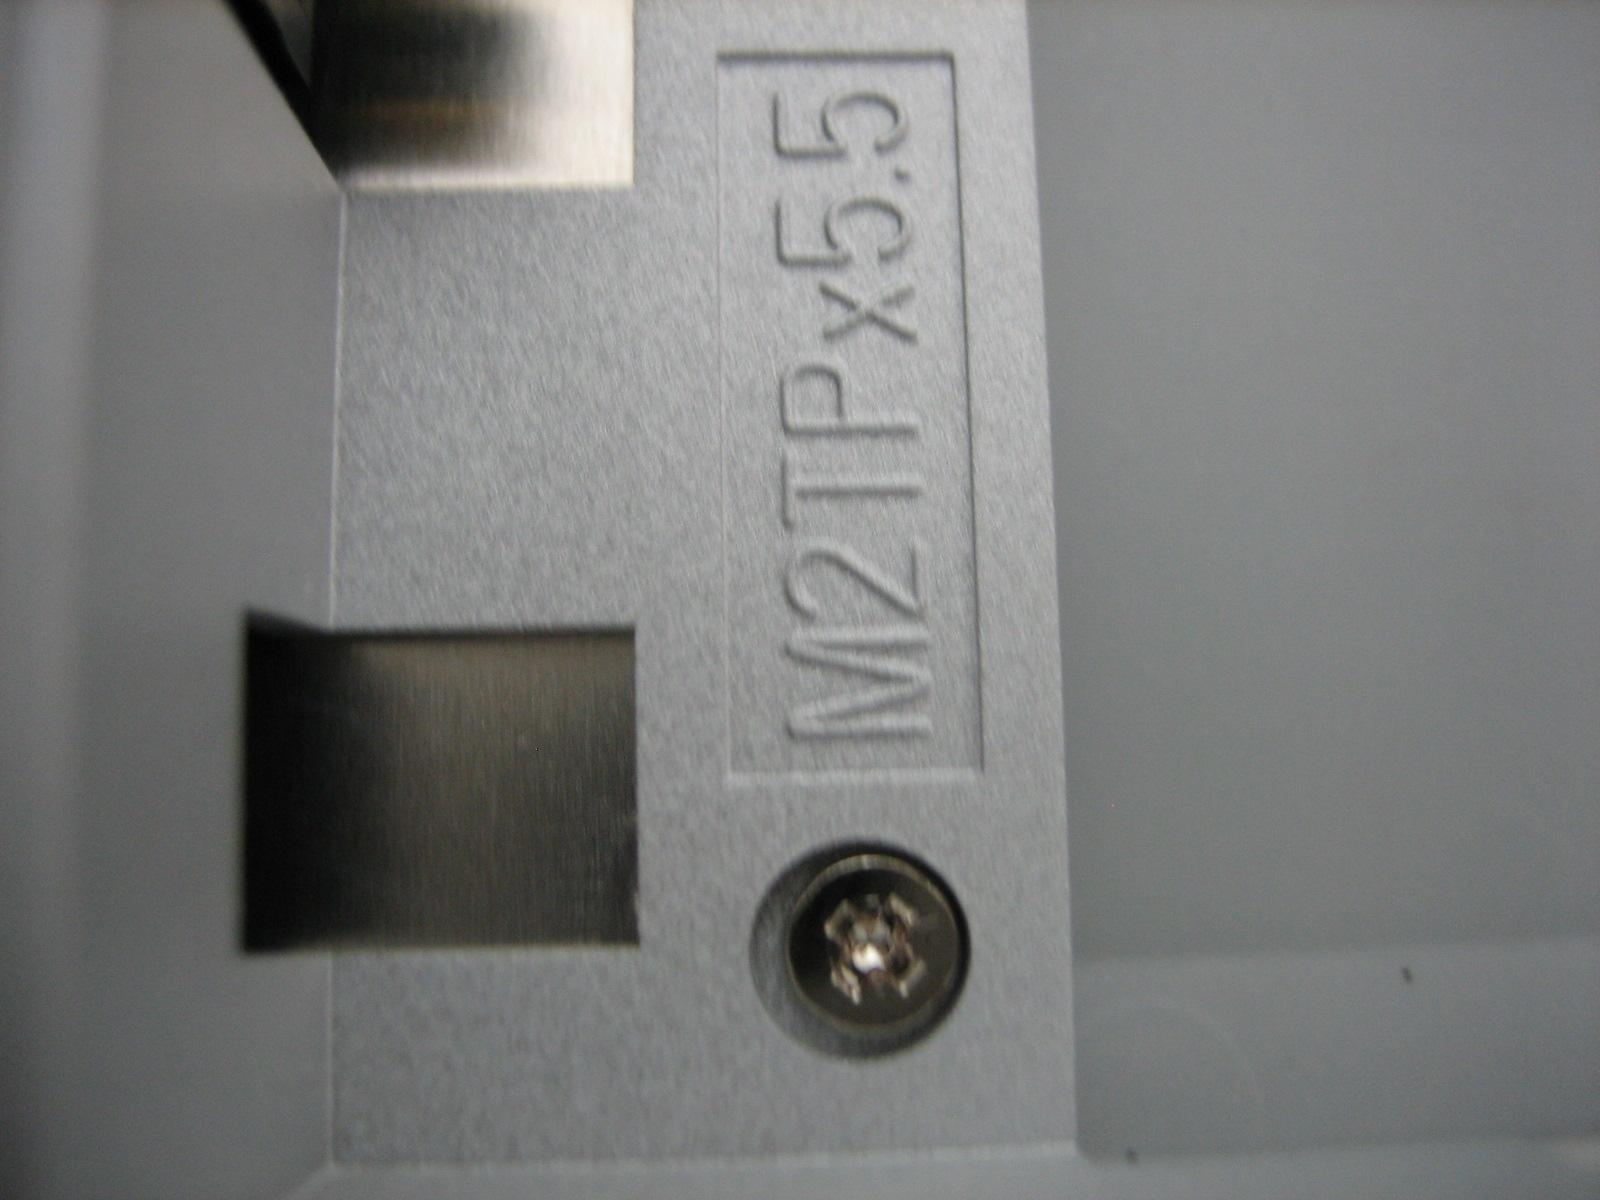 fujitsu manual aotg45latl use 1 fan